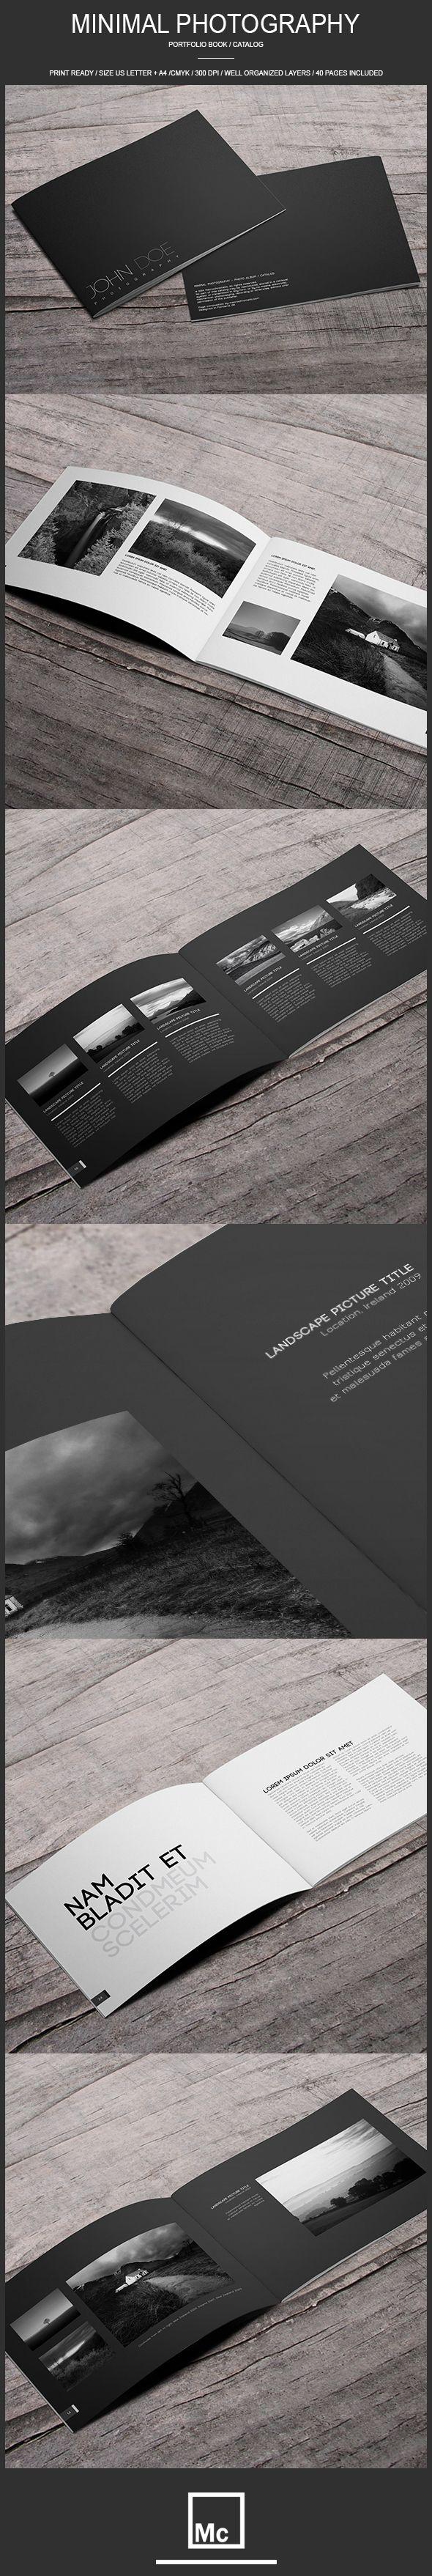 40 Page Minimal - Photography Portfolio Book on Behance